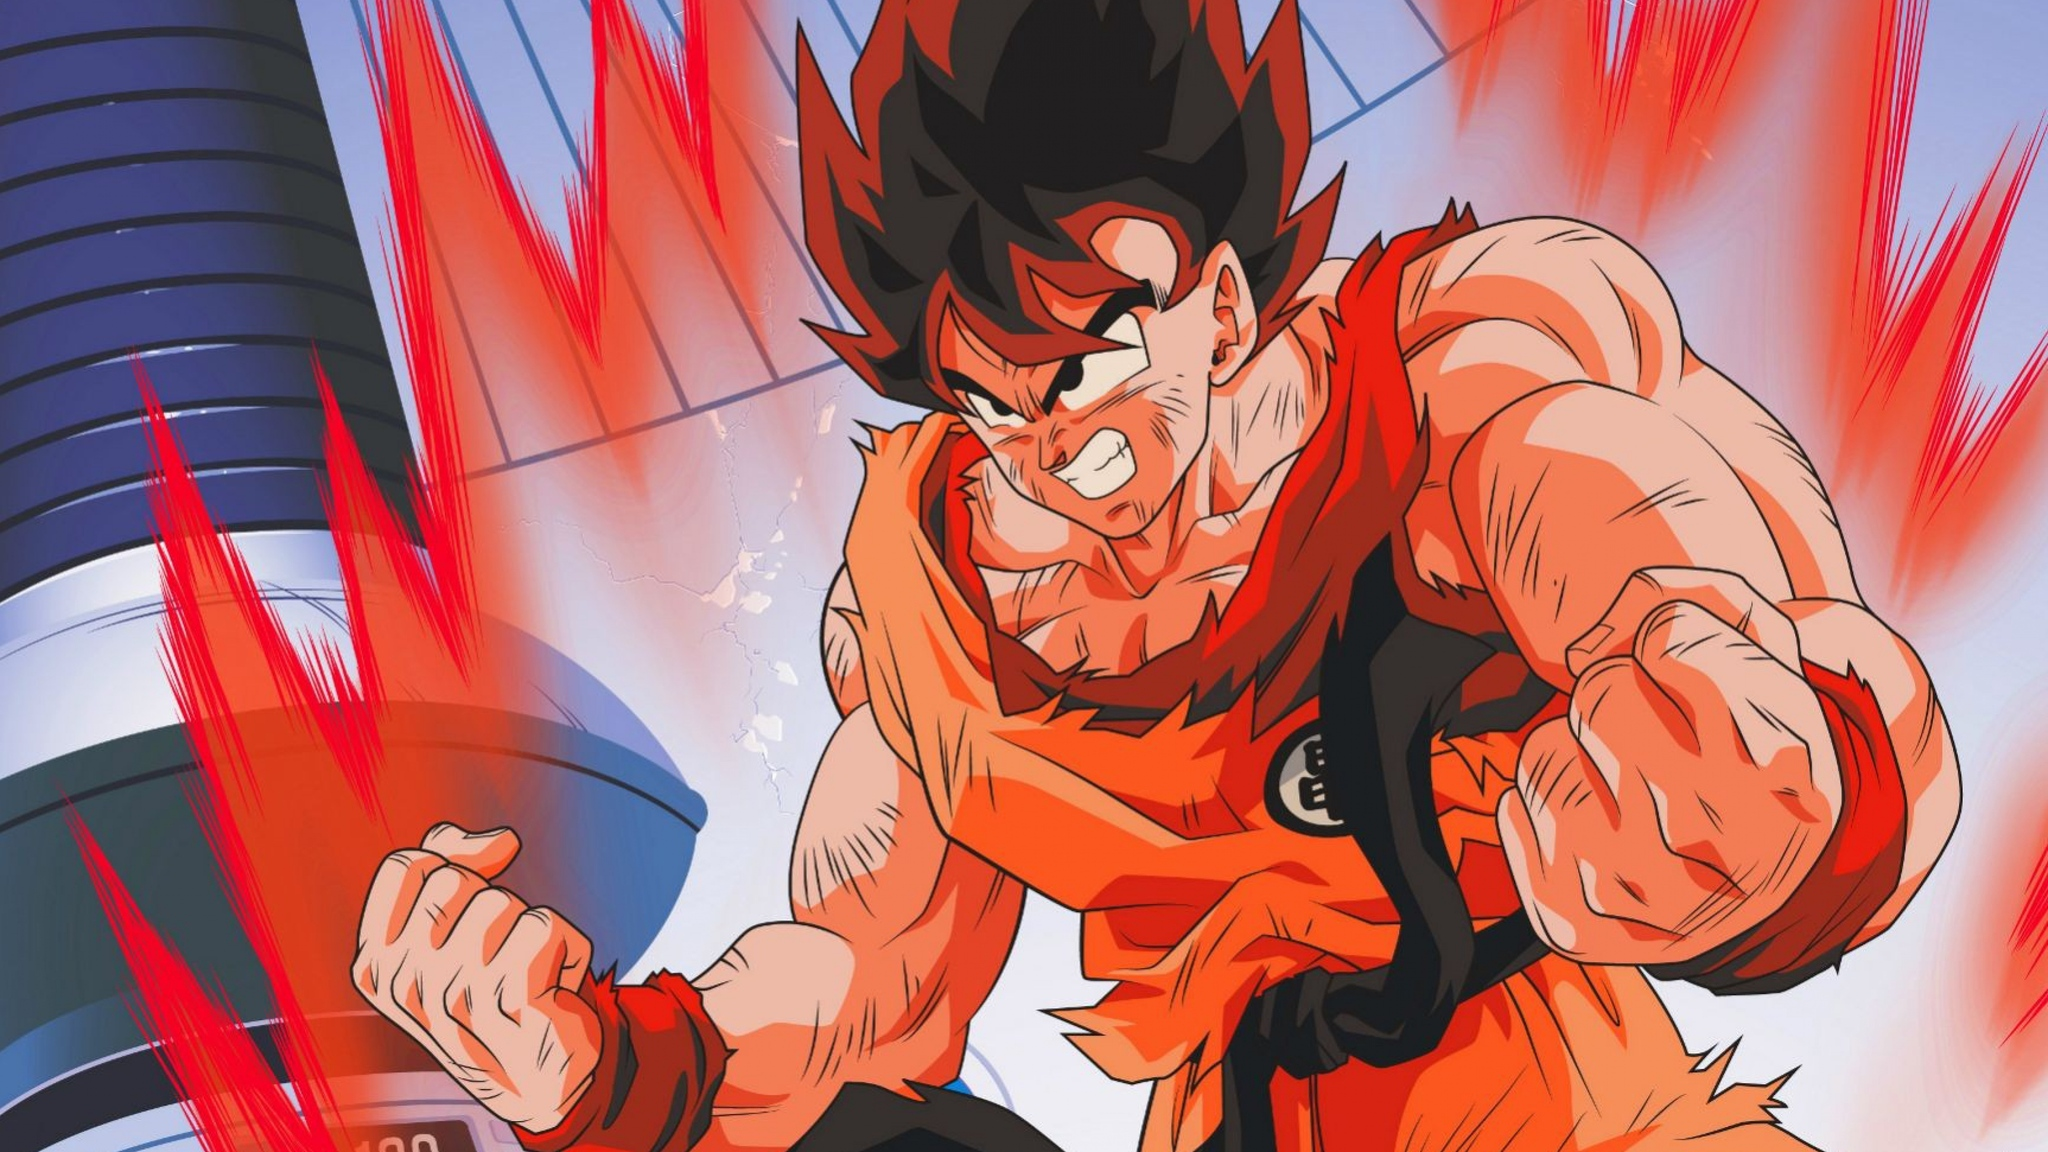 2048x1152 Goku Dragon Ball Z 4k 2048x1152 Resolution Hd 4k